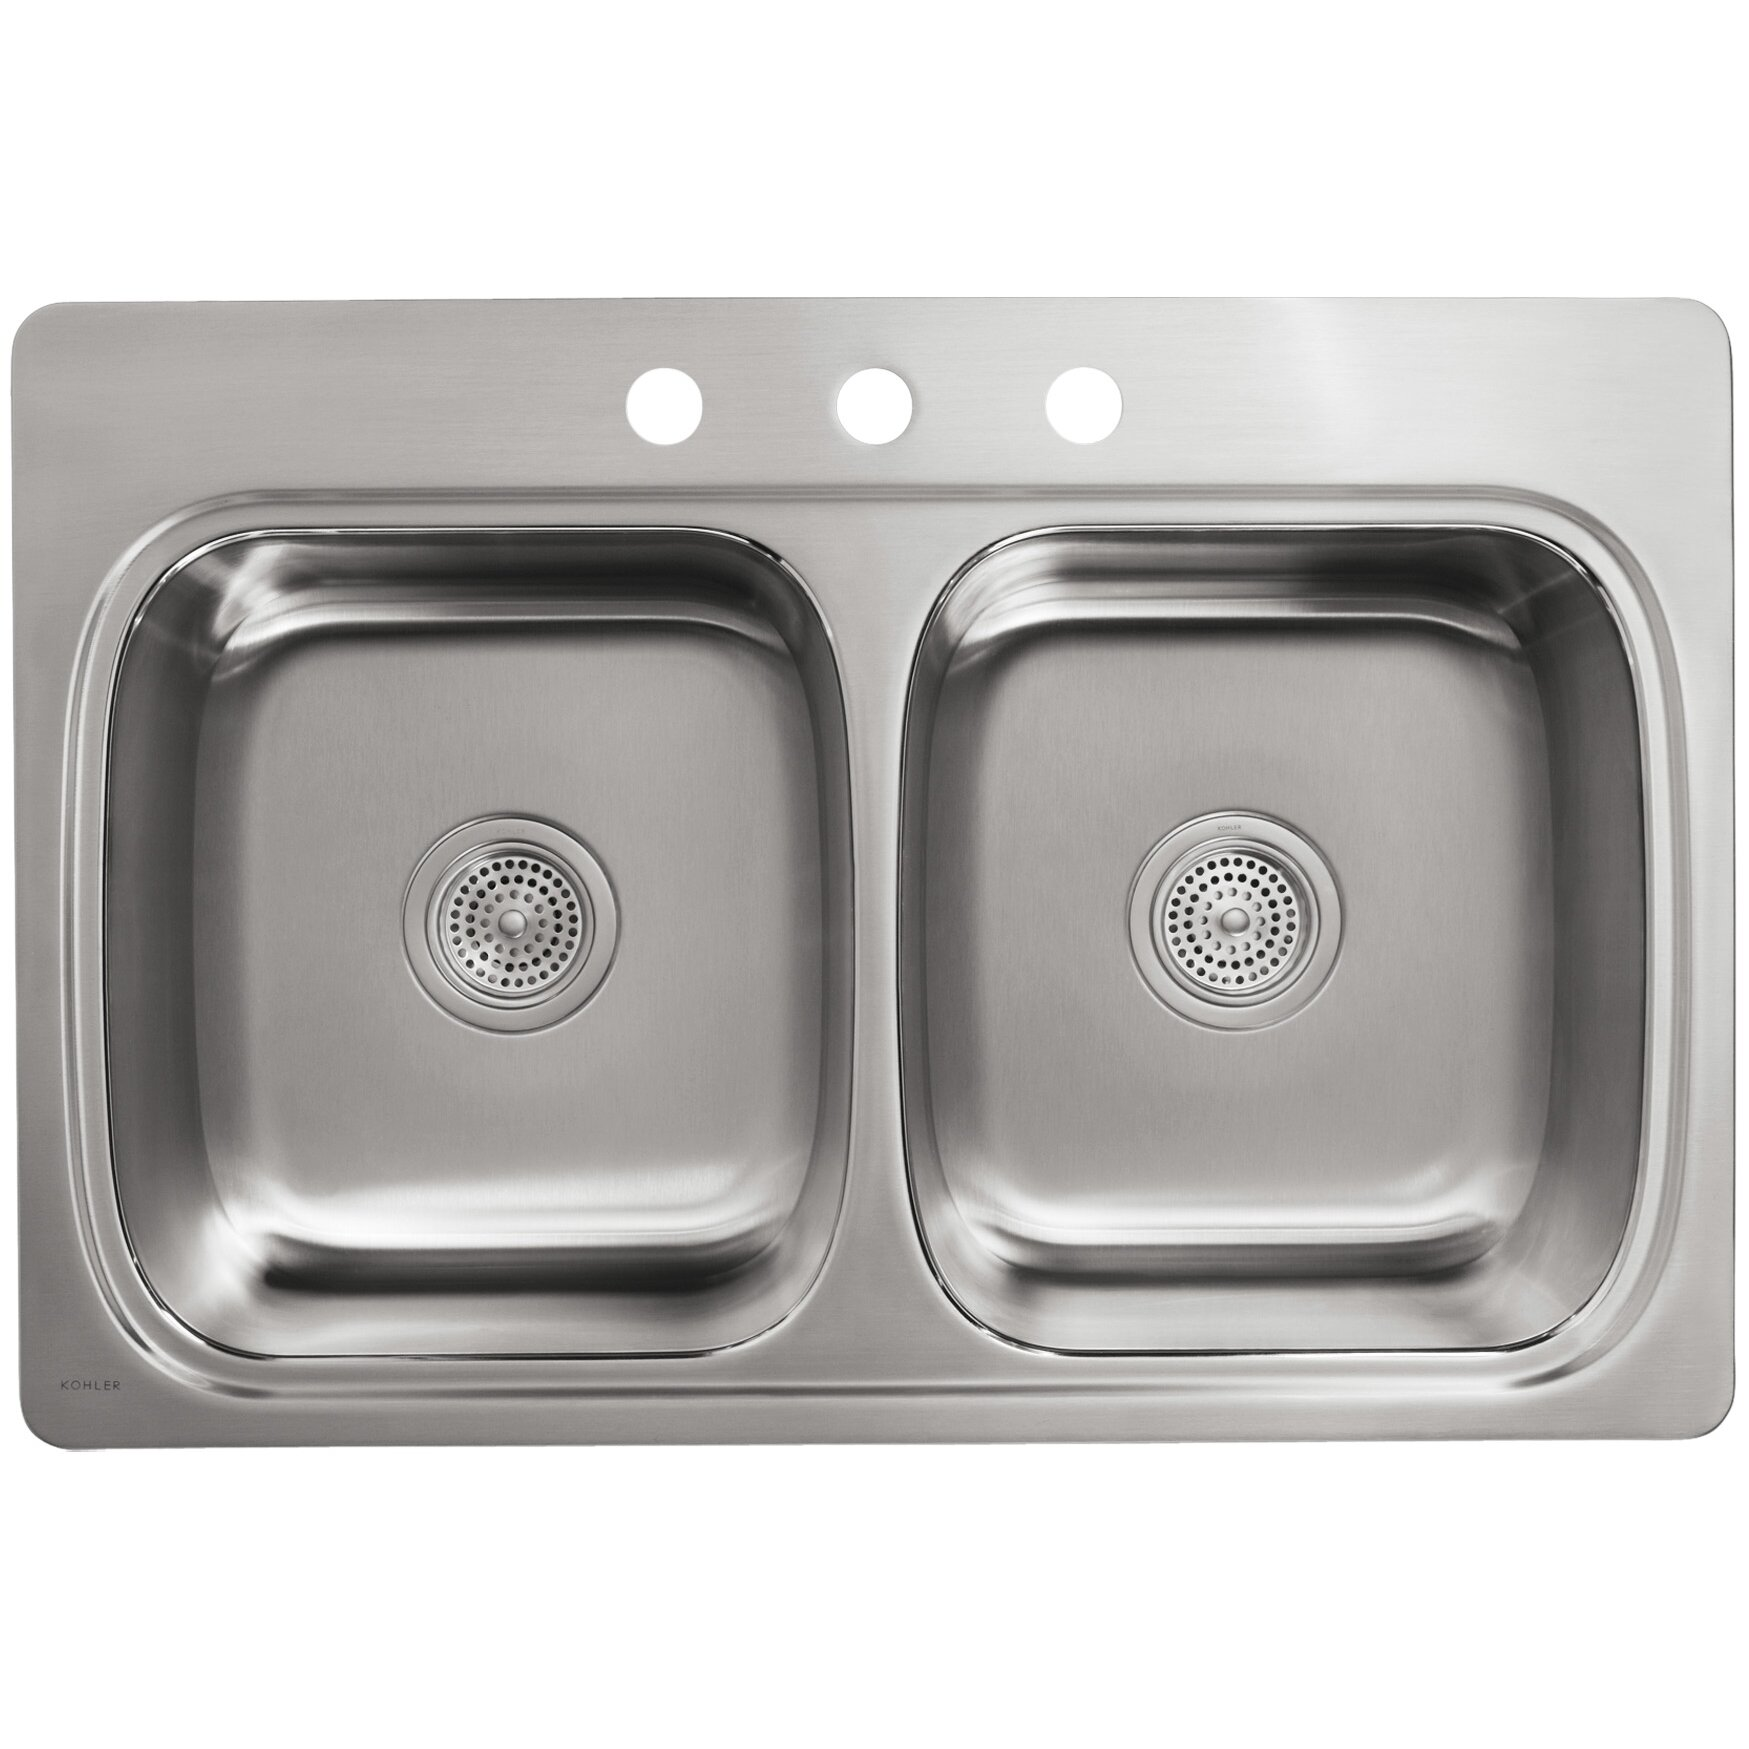 Kohler Verse Double Bowl Kitchen Sink